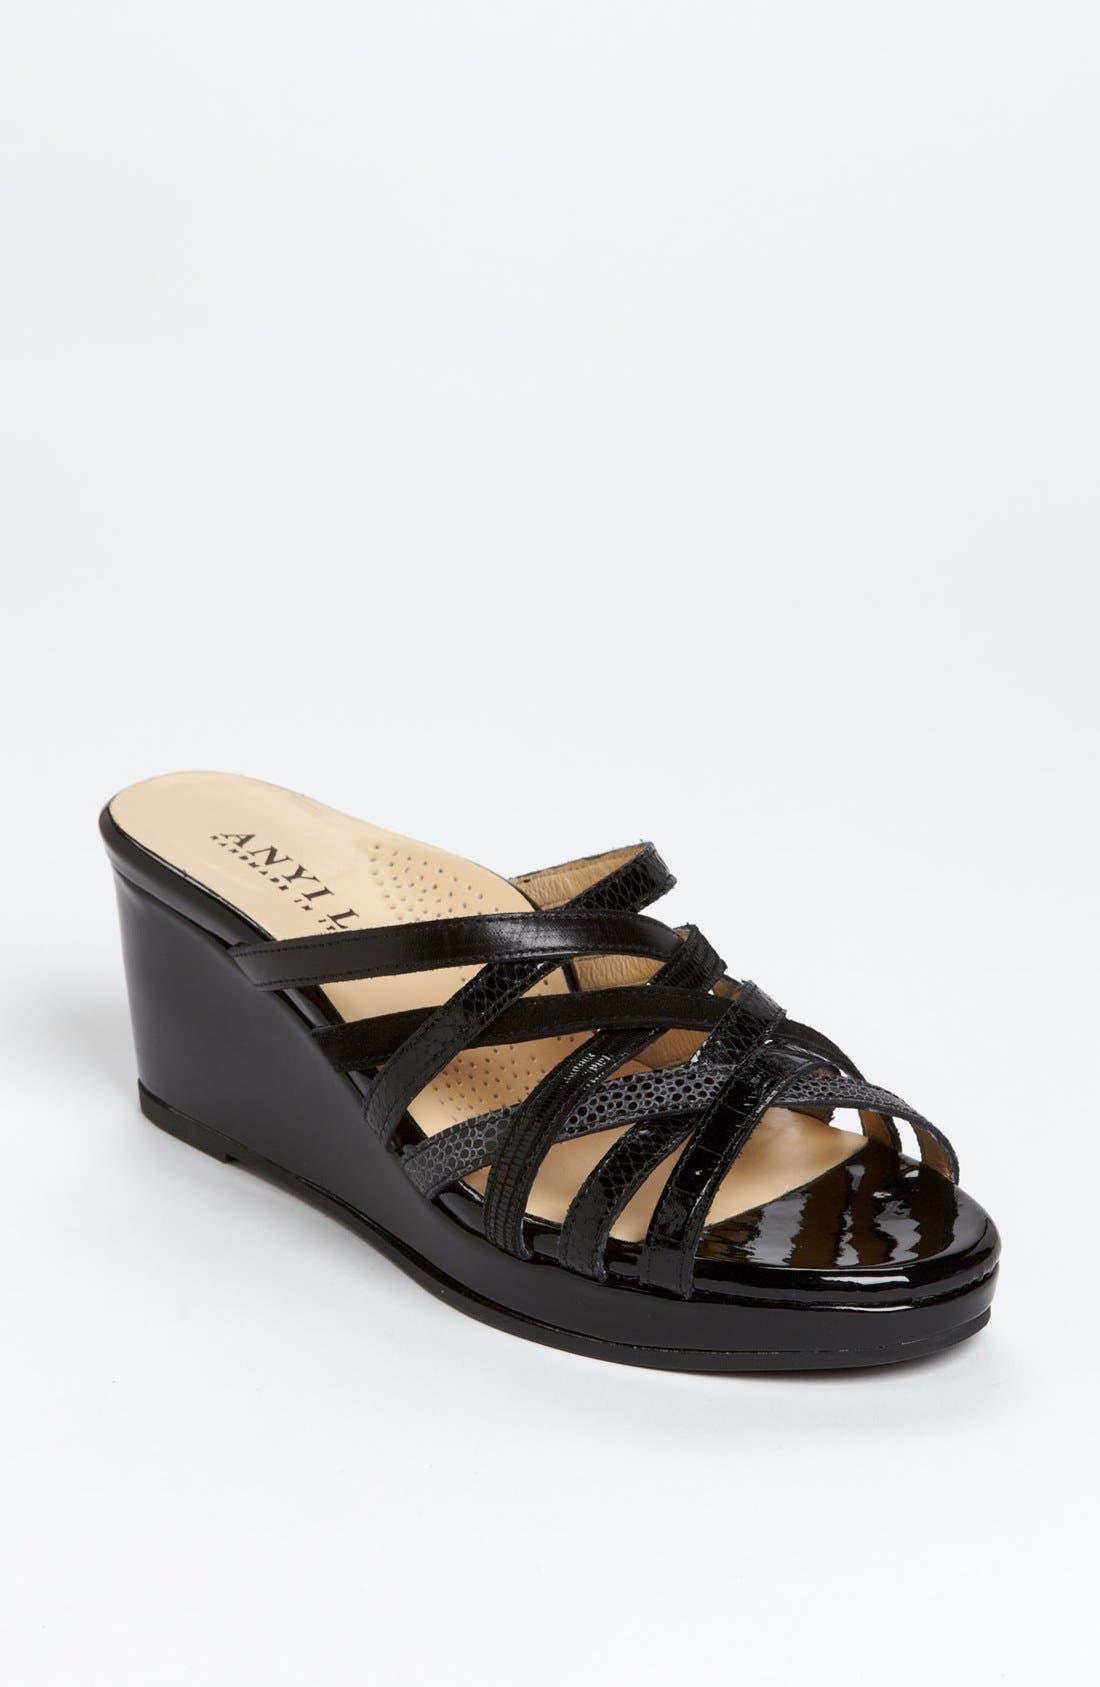 Main Image - Anyi Lu 'Isis' Sandal